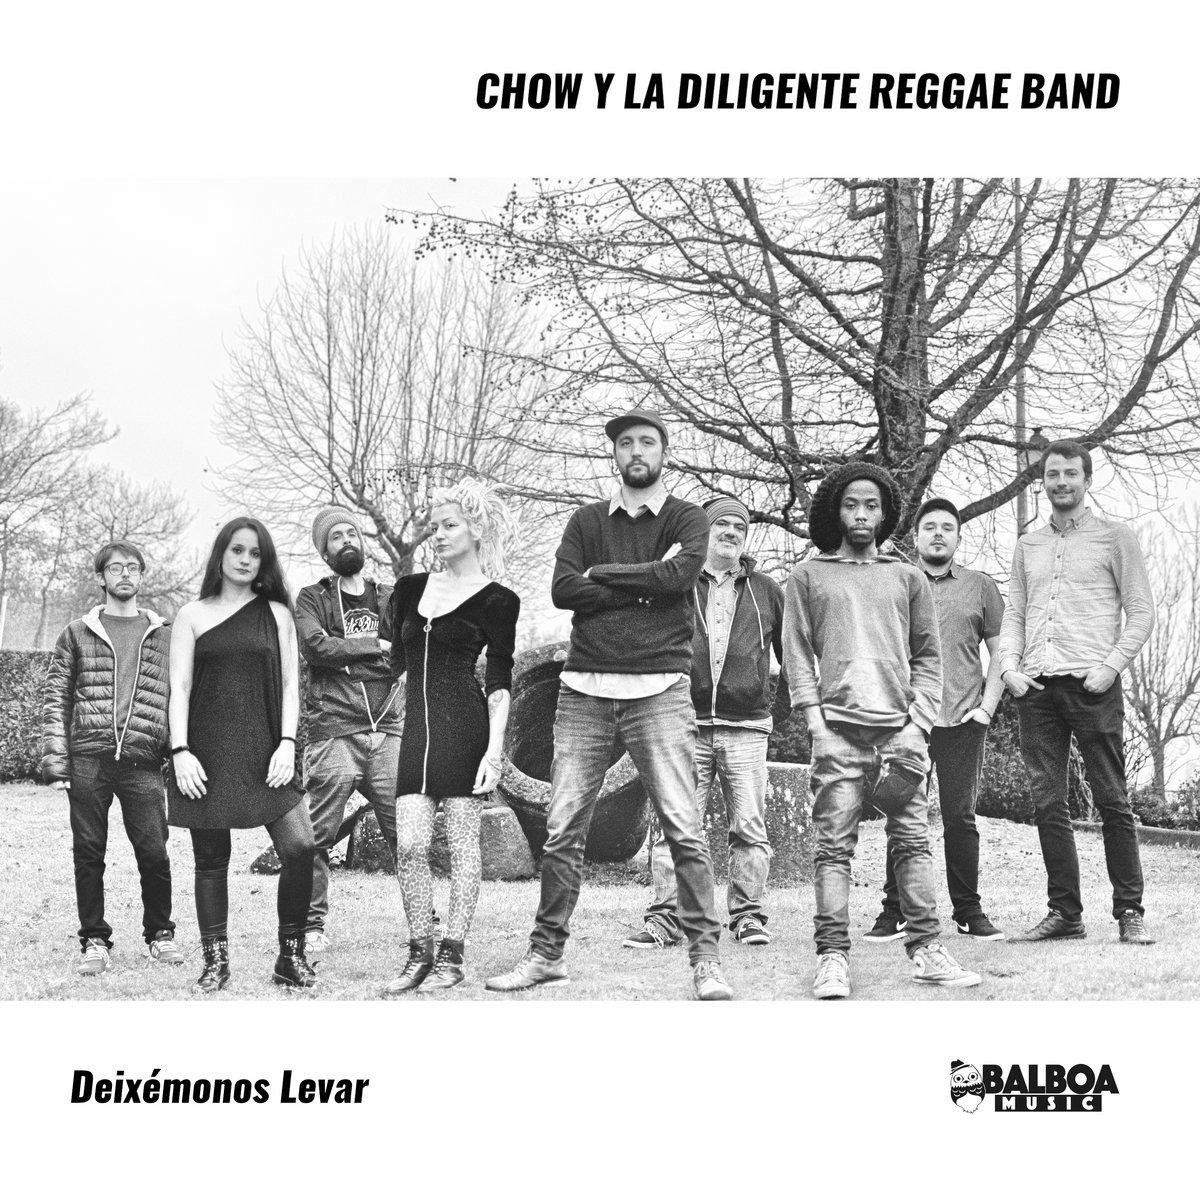 Chow y La Diligente Reggae Band - Deixémonos Levar